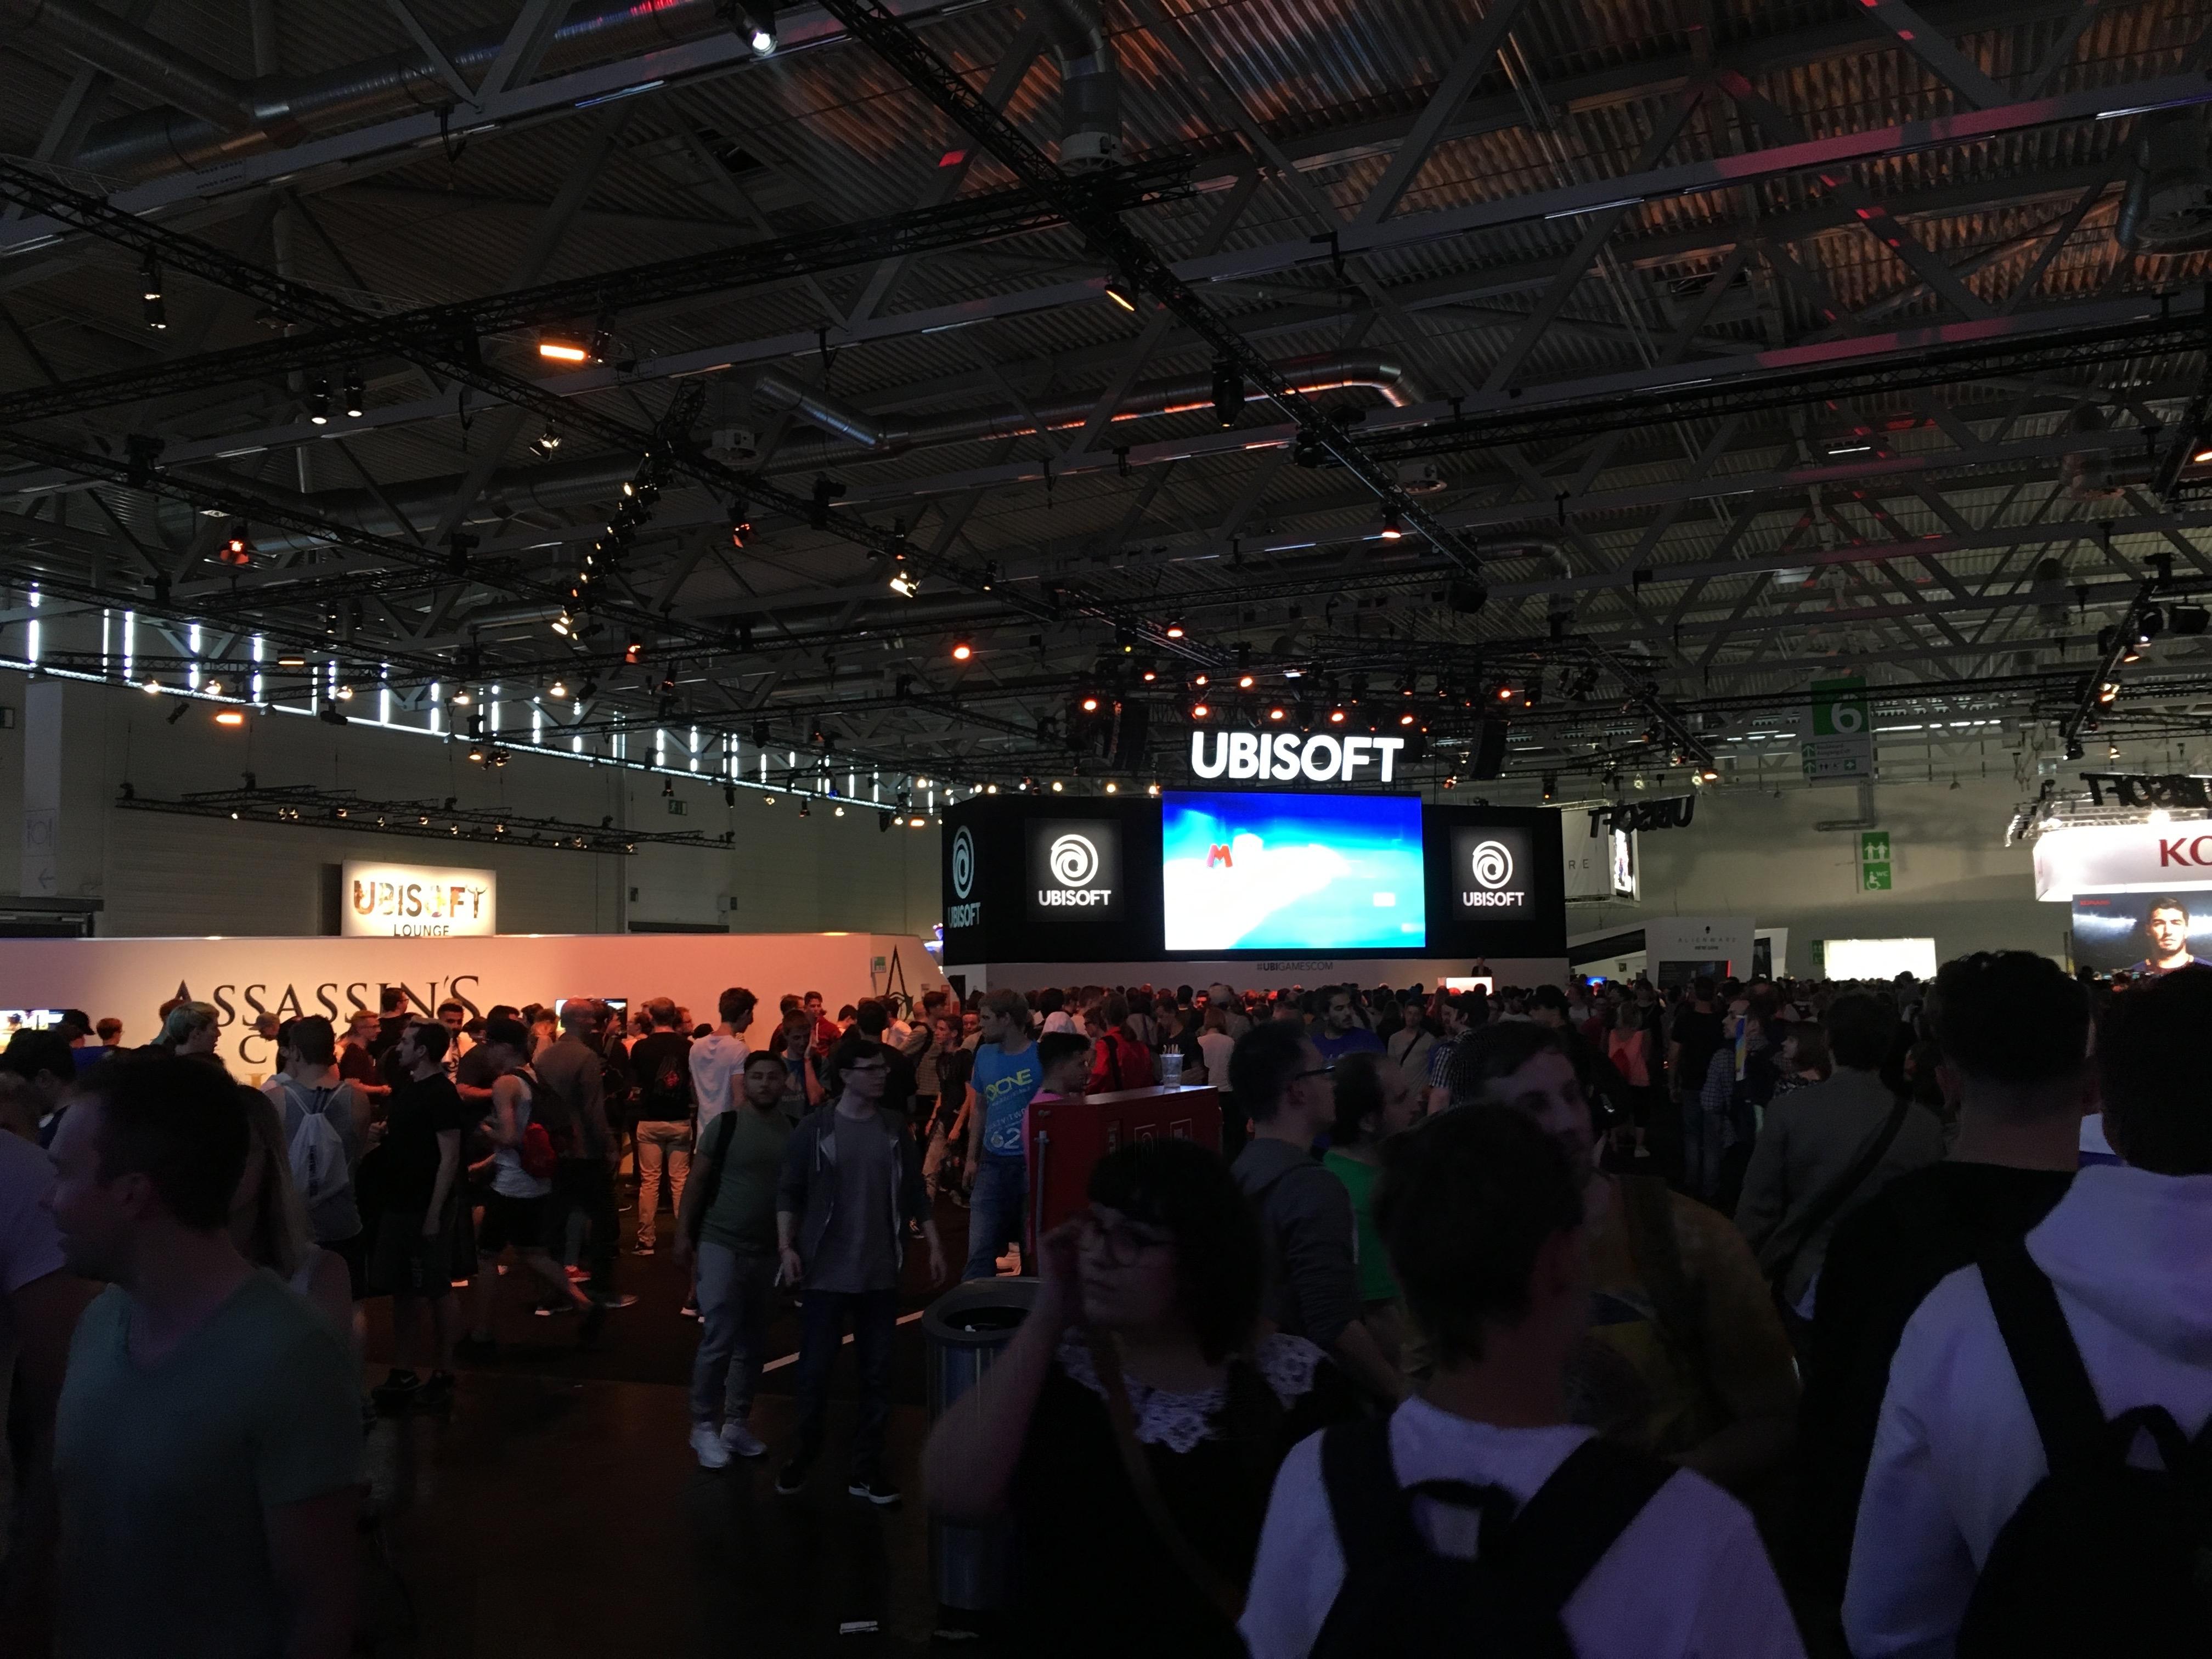 Gamescom Ubisoft 2017